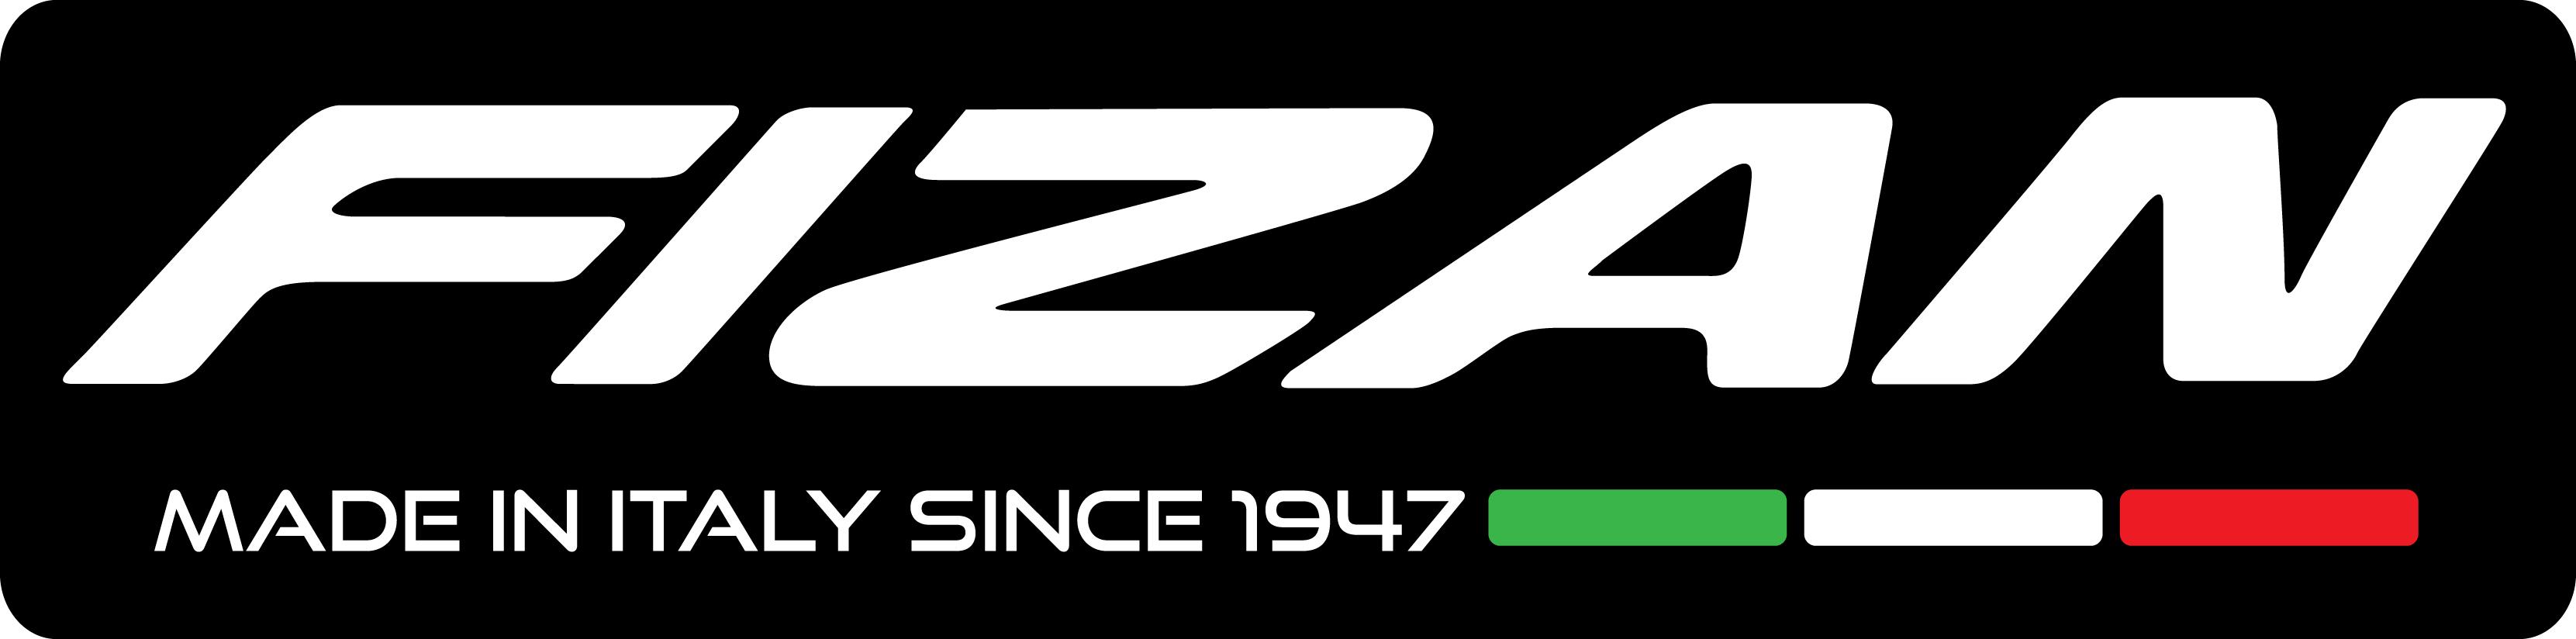 http://pfnw.eu/wp-content/uploads/2020/03/logo-2014-FIZAN-BLACK.jpg